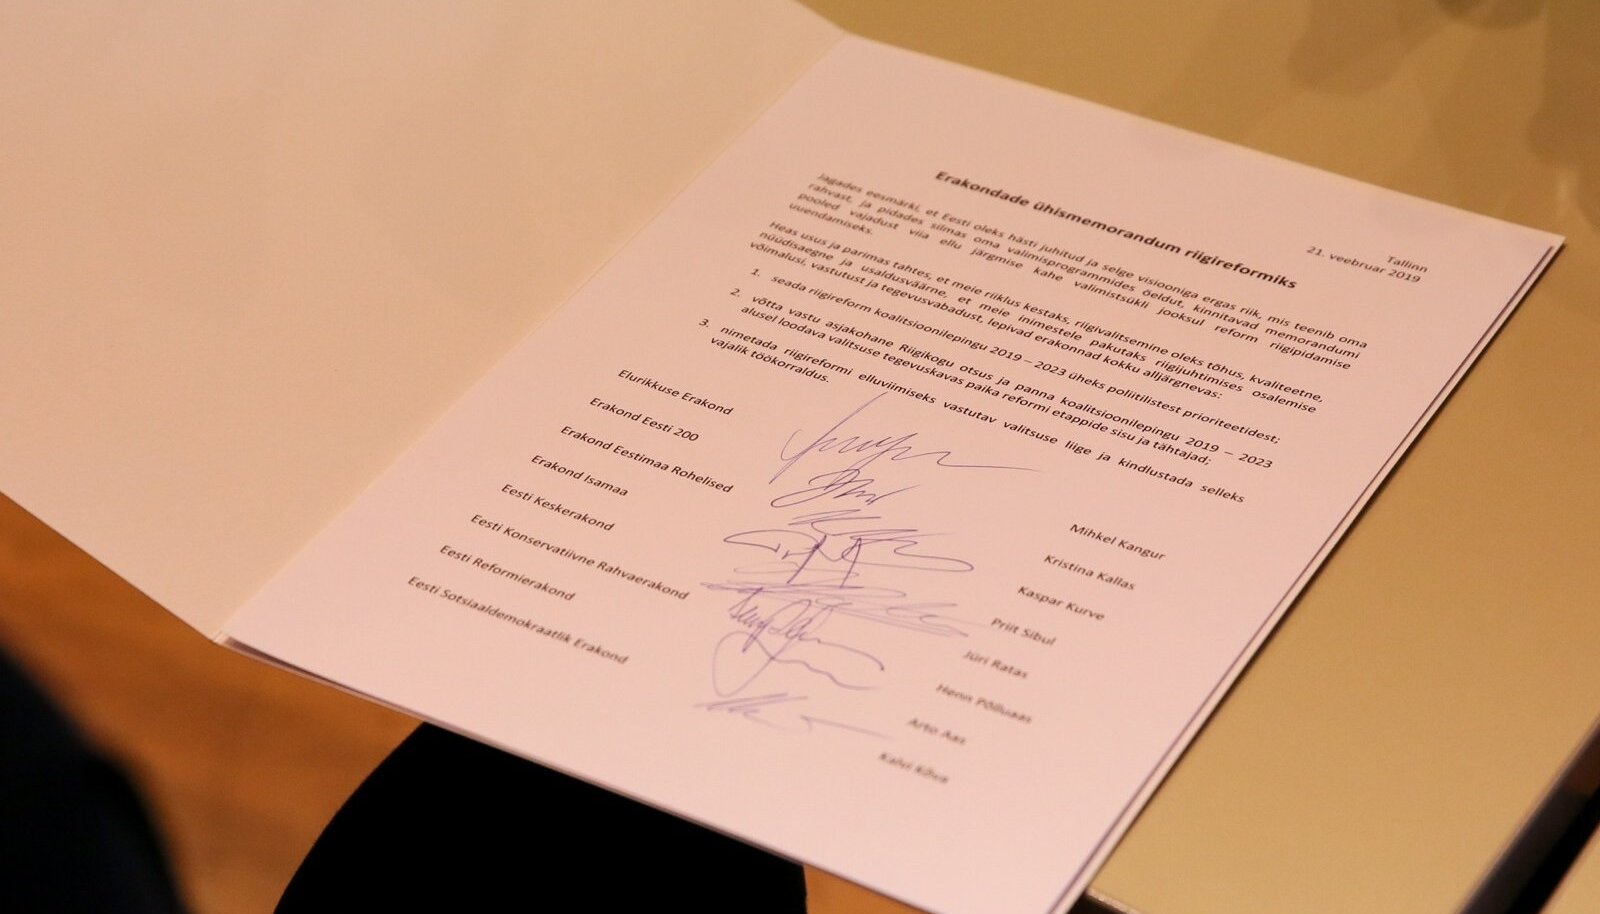 Riigireformi memorandumi allkirjastamine